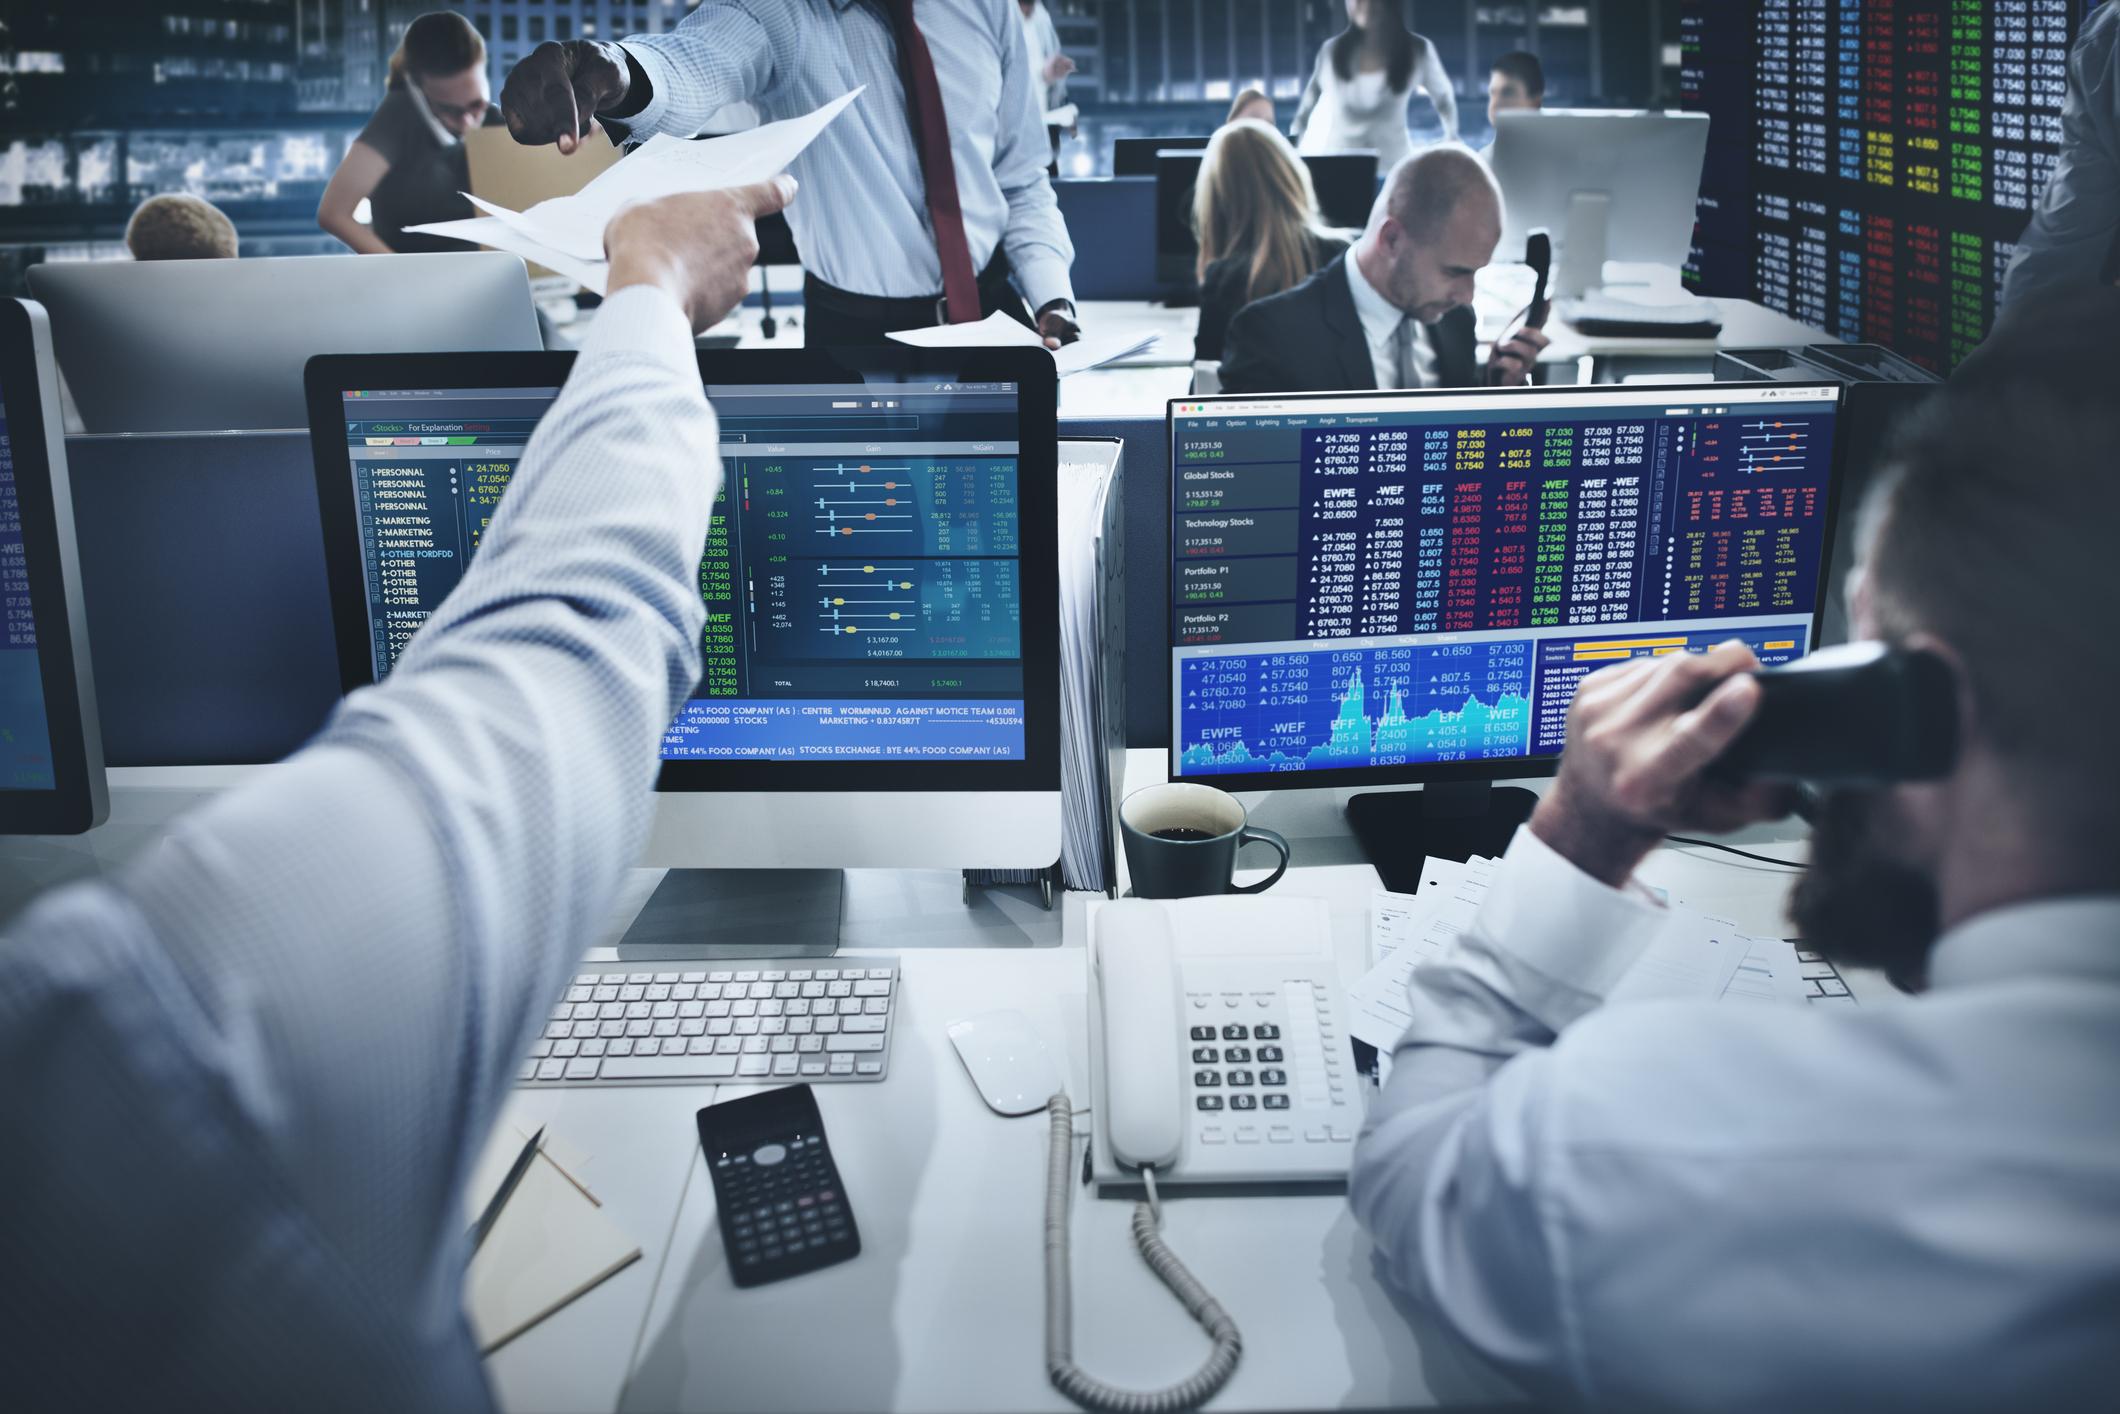 Traders at a bond-trading desk